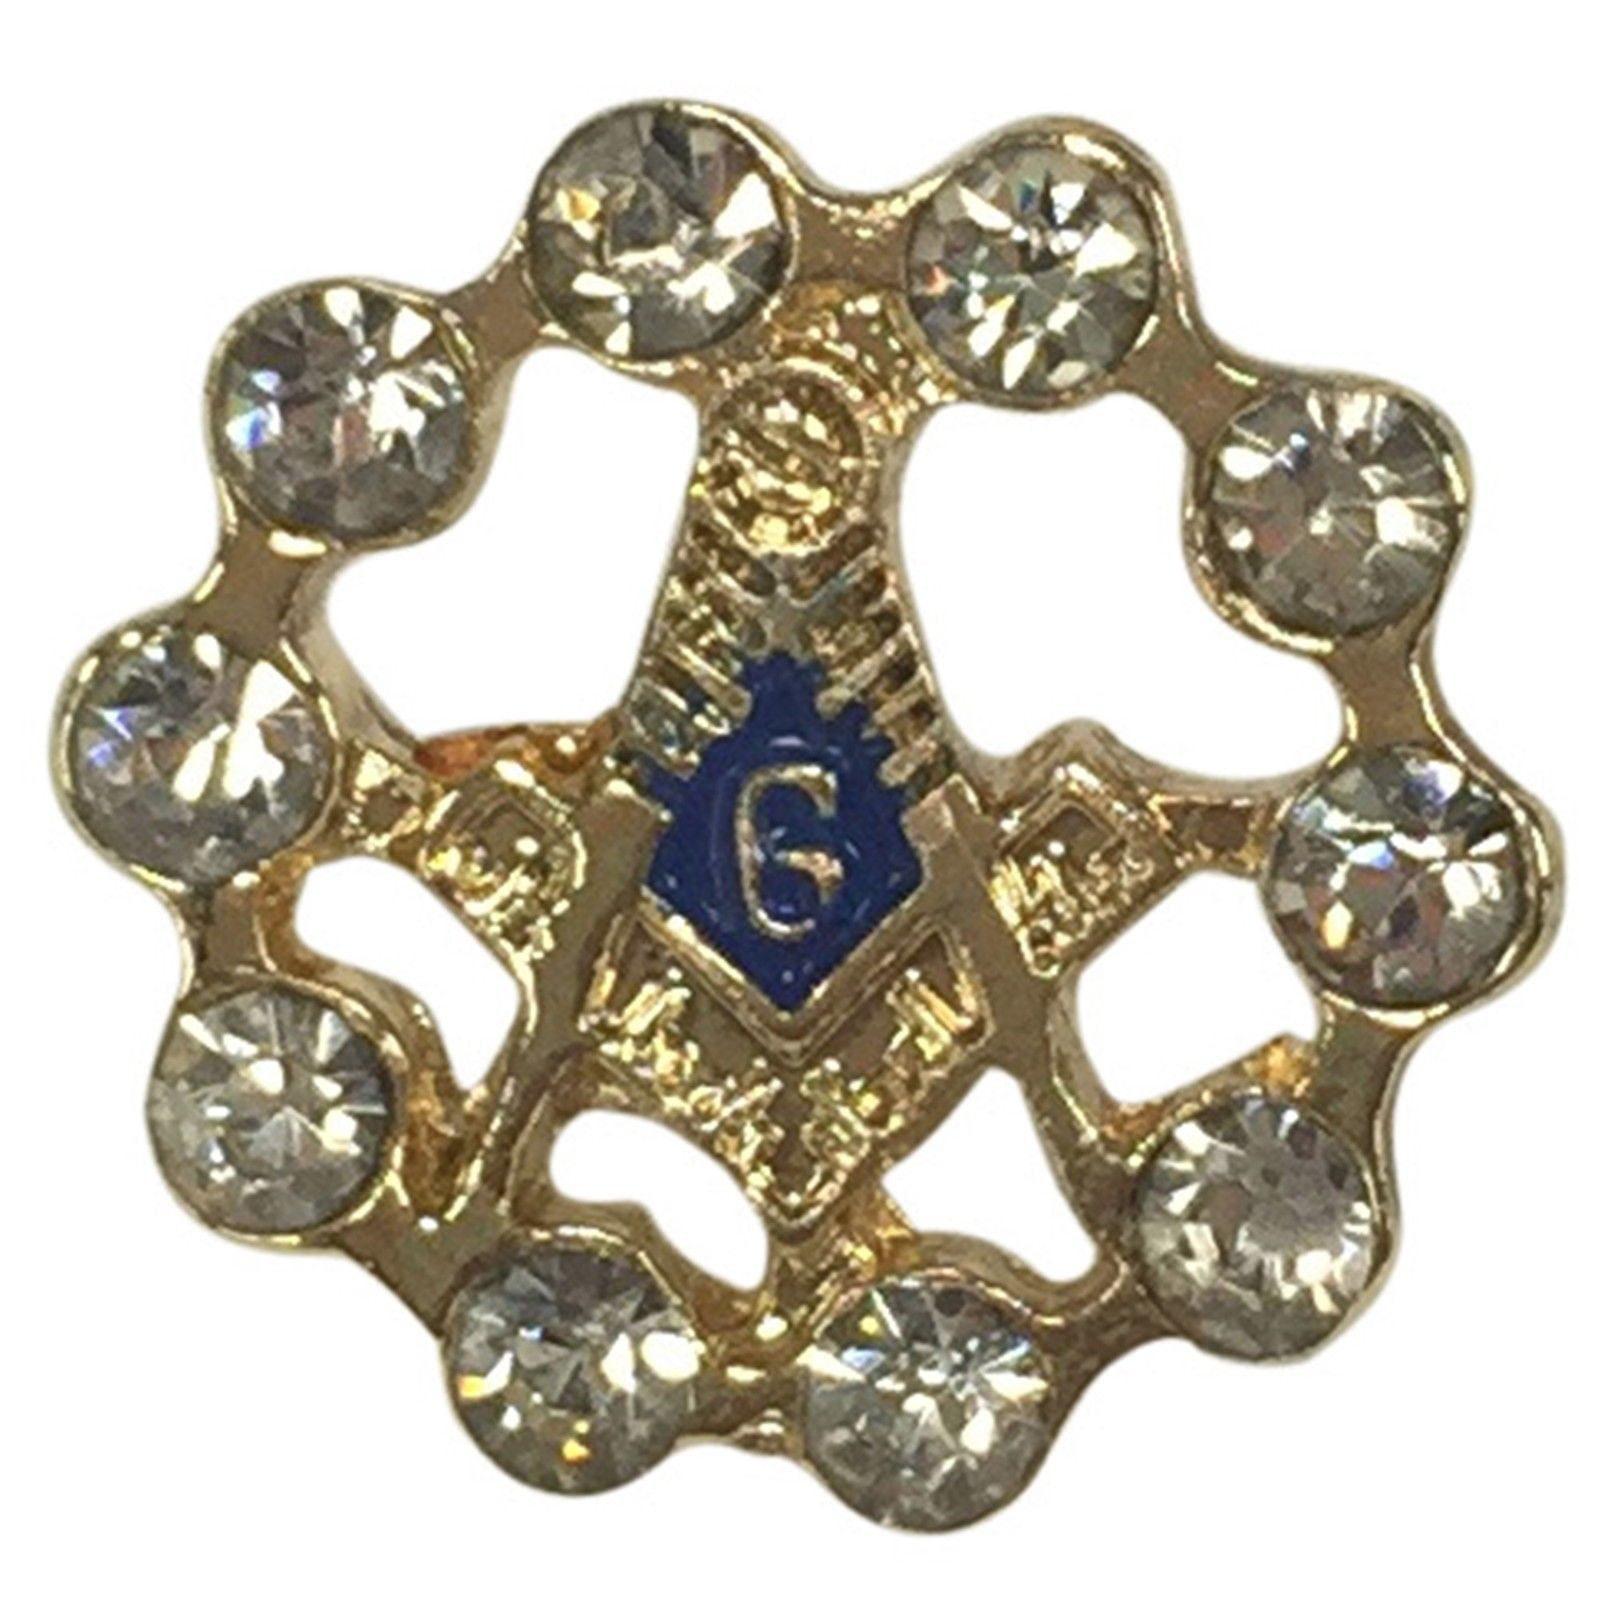 FZ2185 - Mason/Masonic Rhinestone Pin